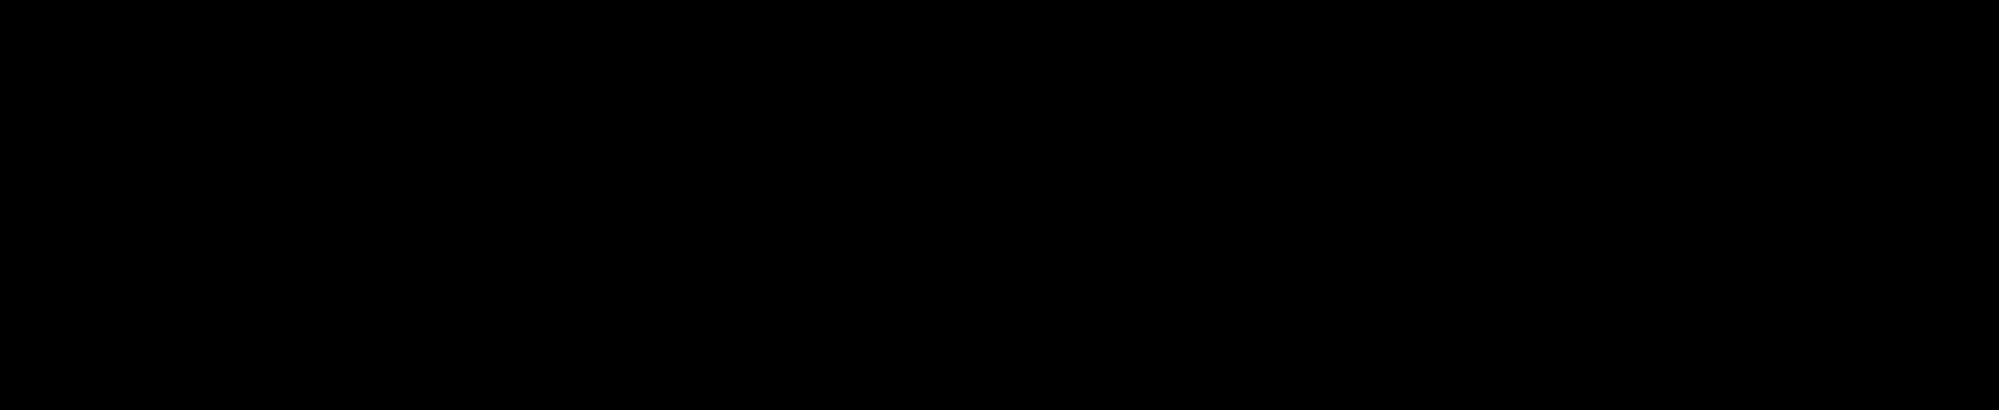 image56.png